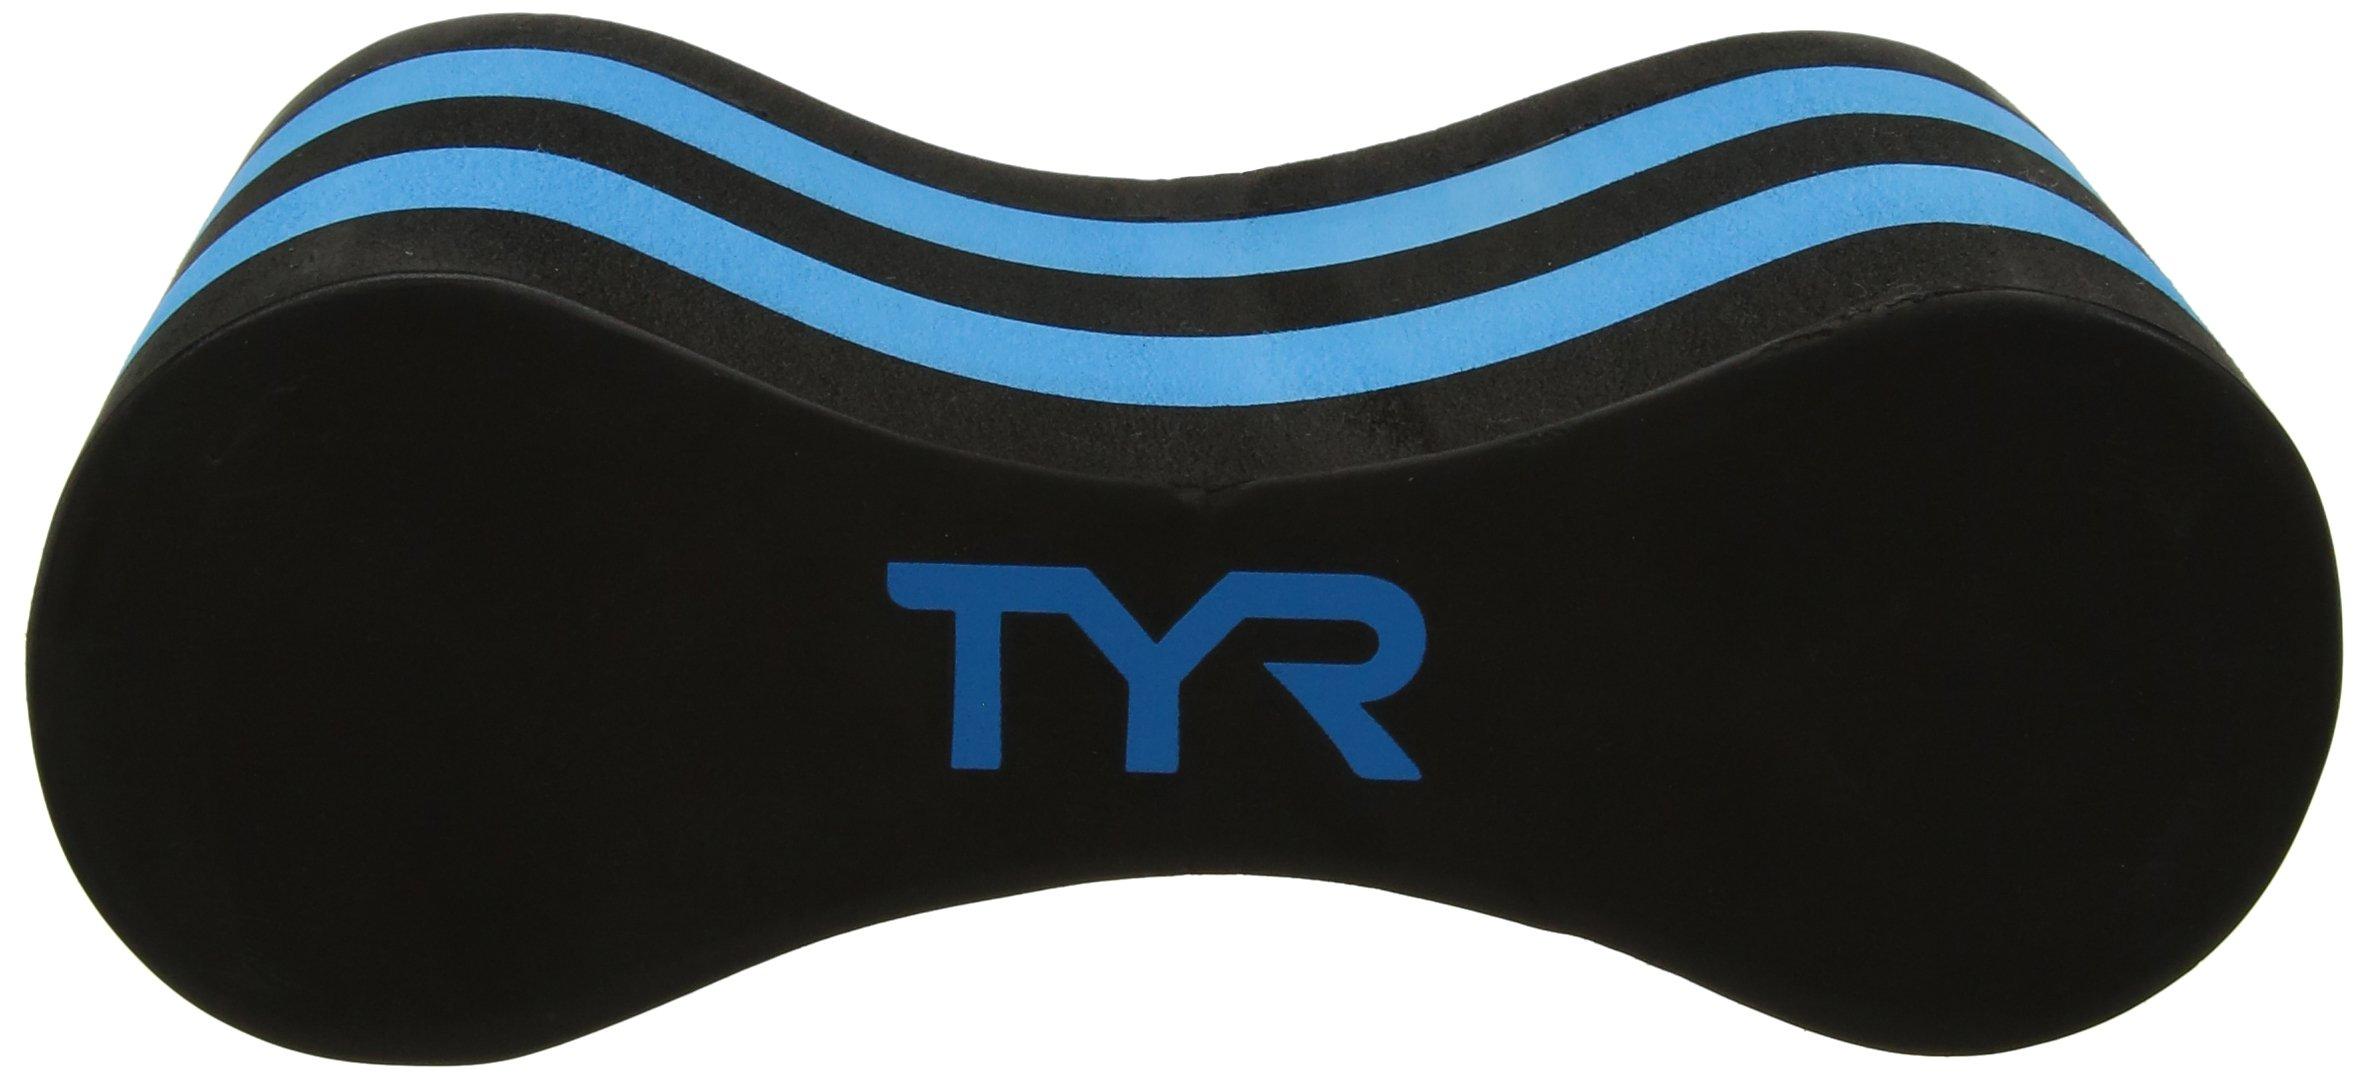 TYR  11LPFALL  Pull Float, Black/Blue